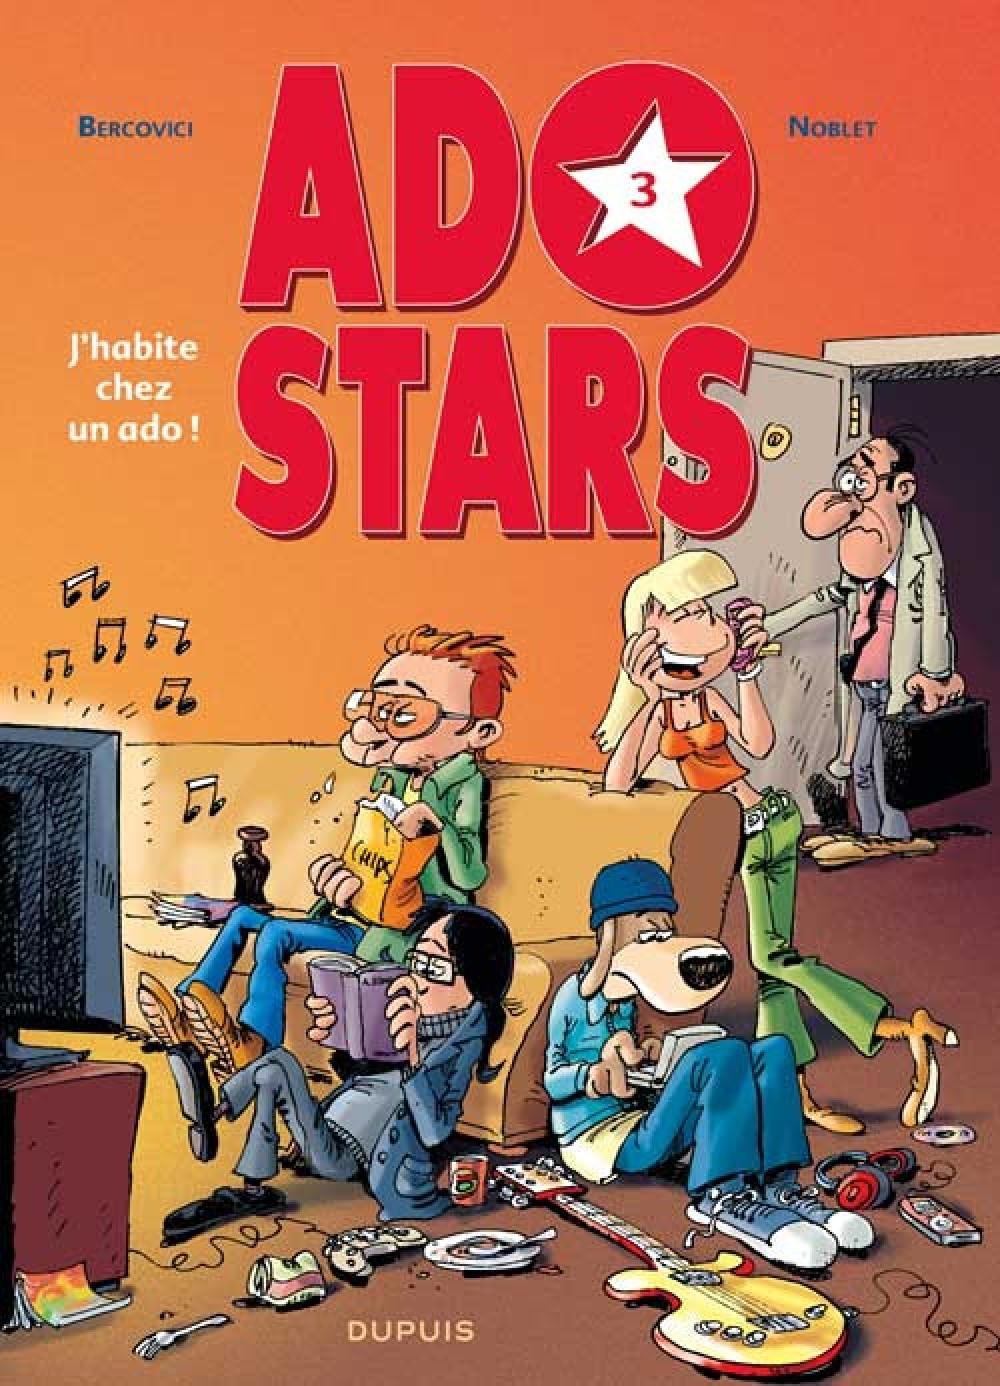 J'AHABIE CHEZ UN ADO ! - ADOS STARS - T3